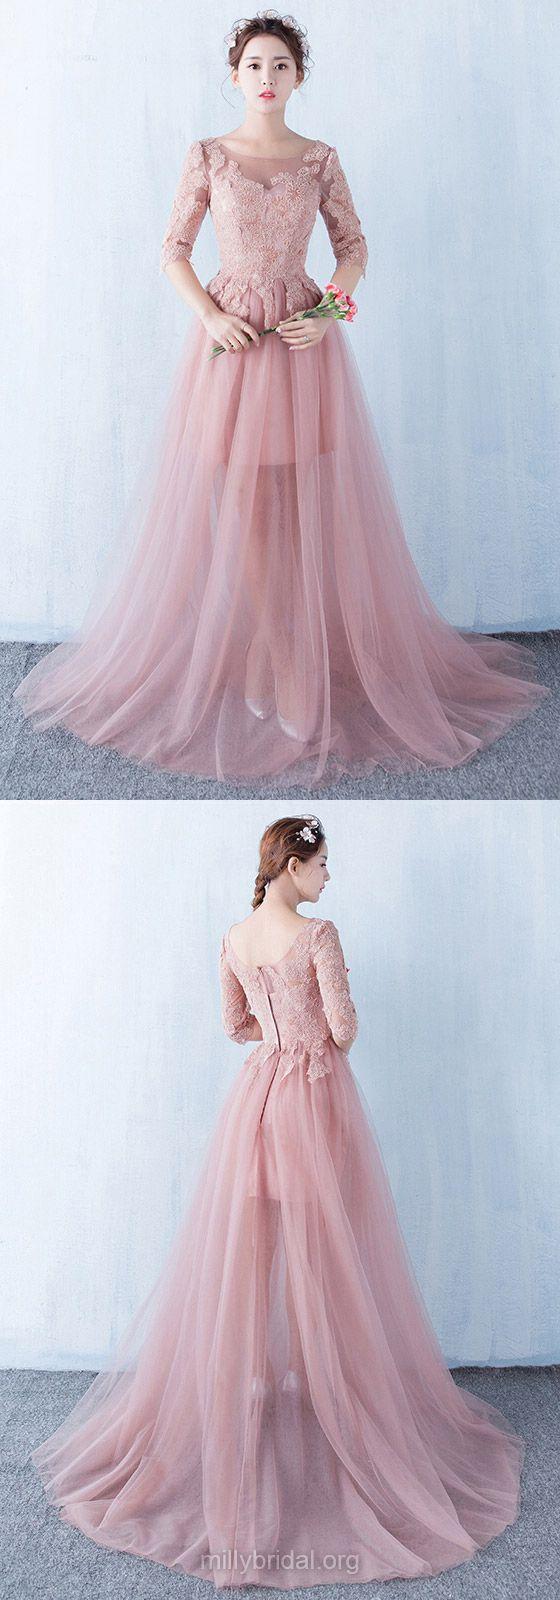 Pink prom dresses long party dresses princess scoop neck